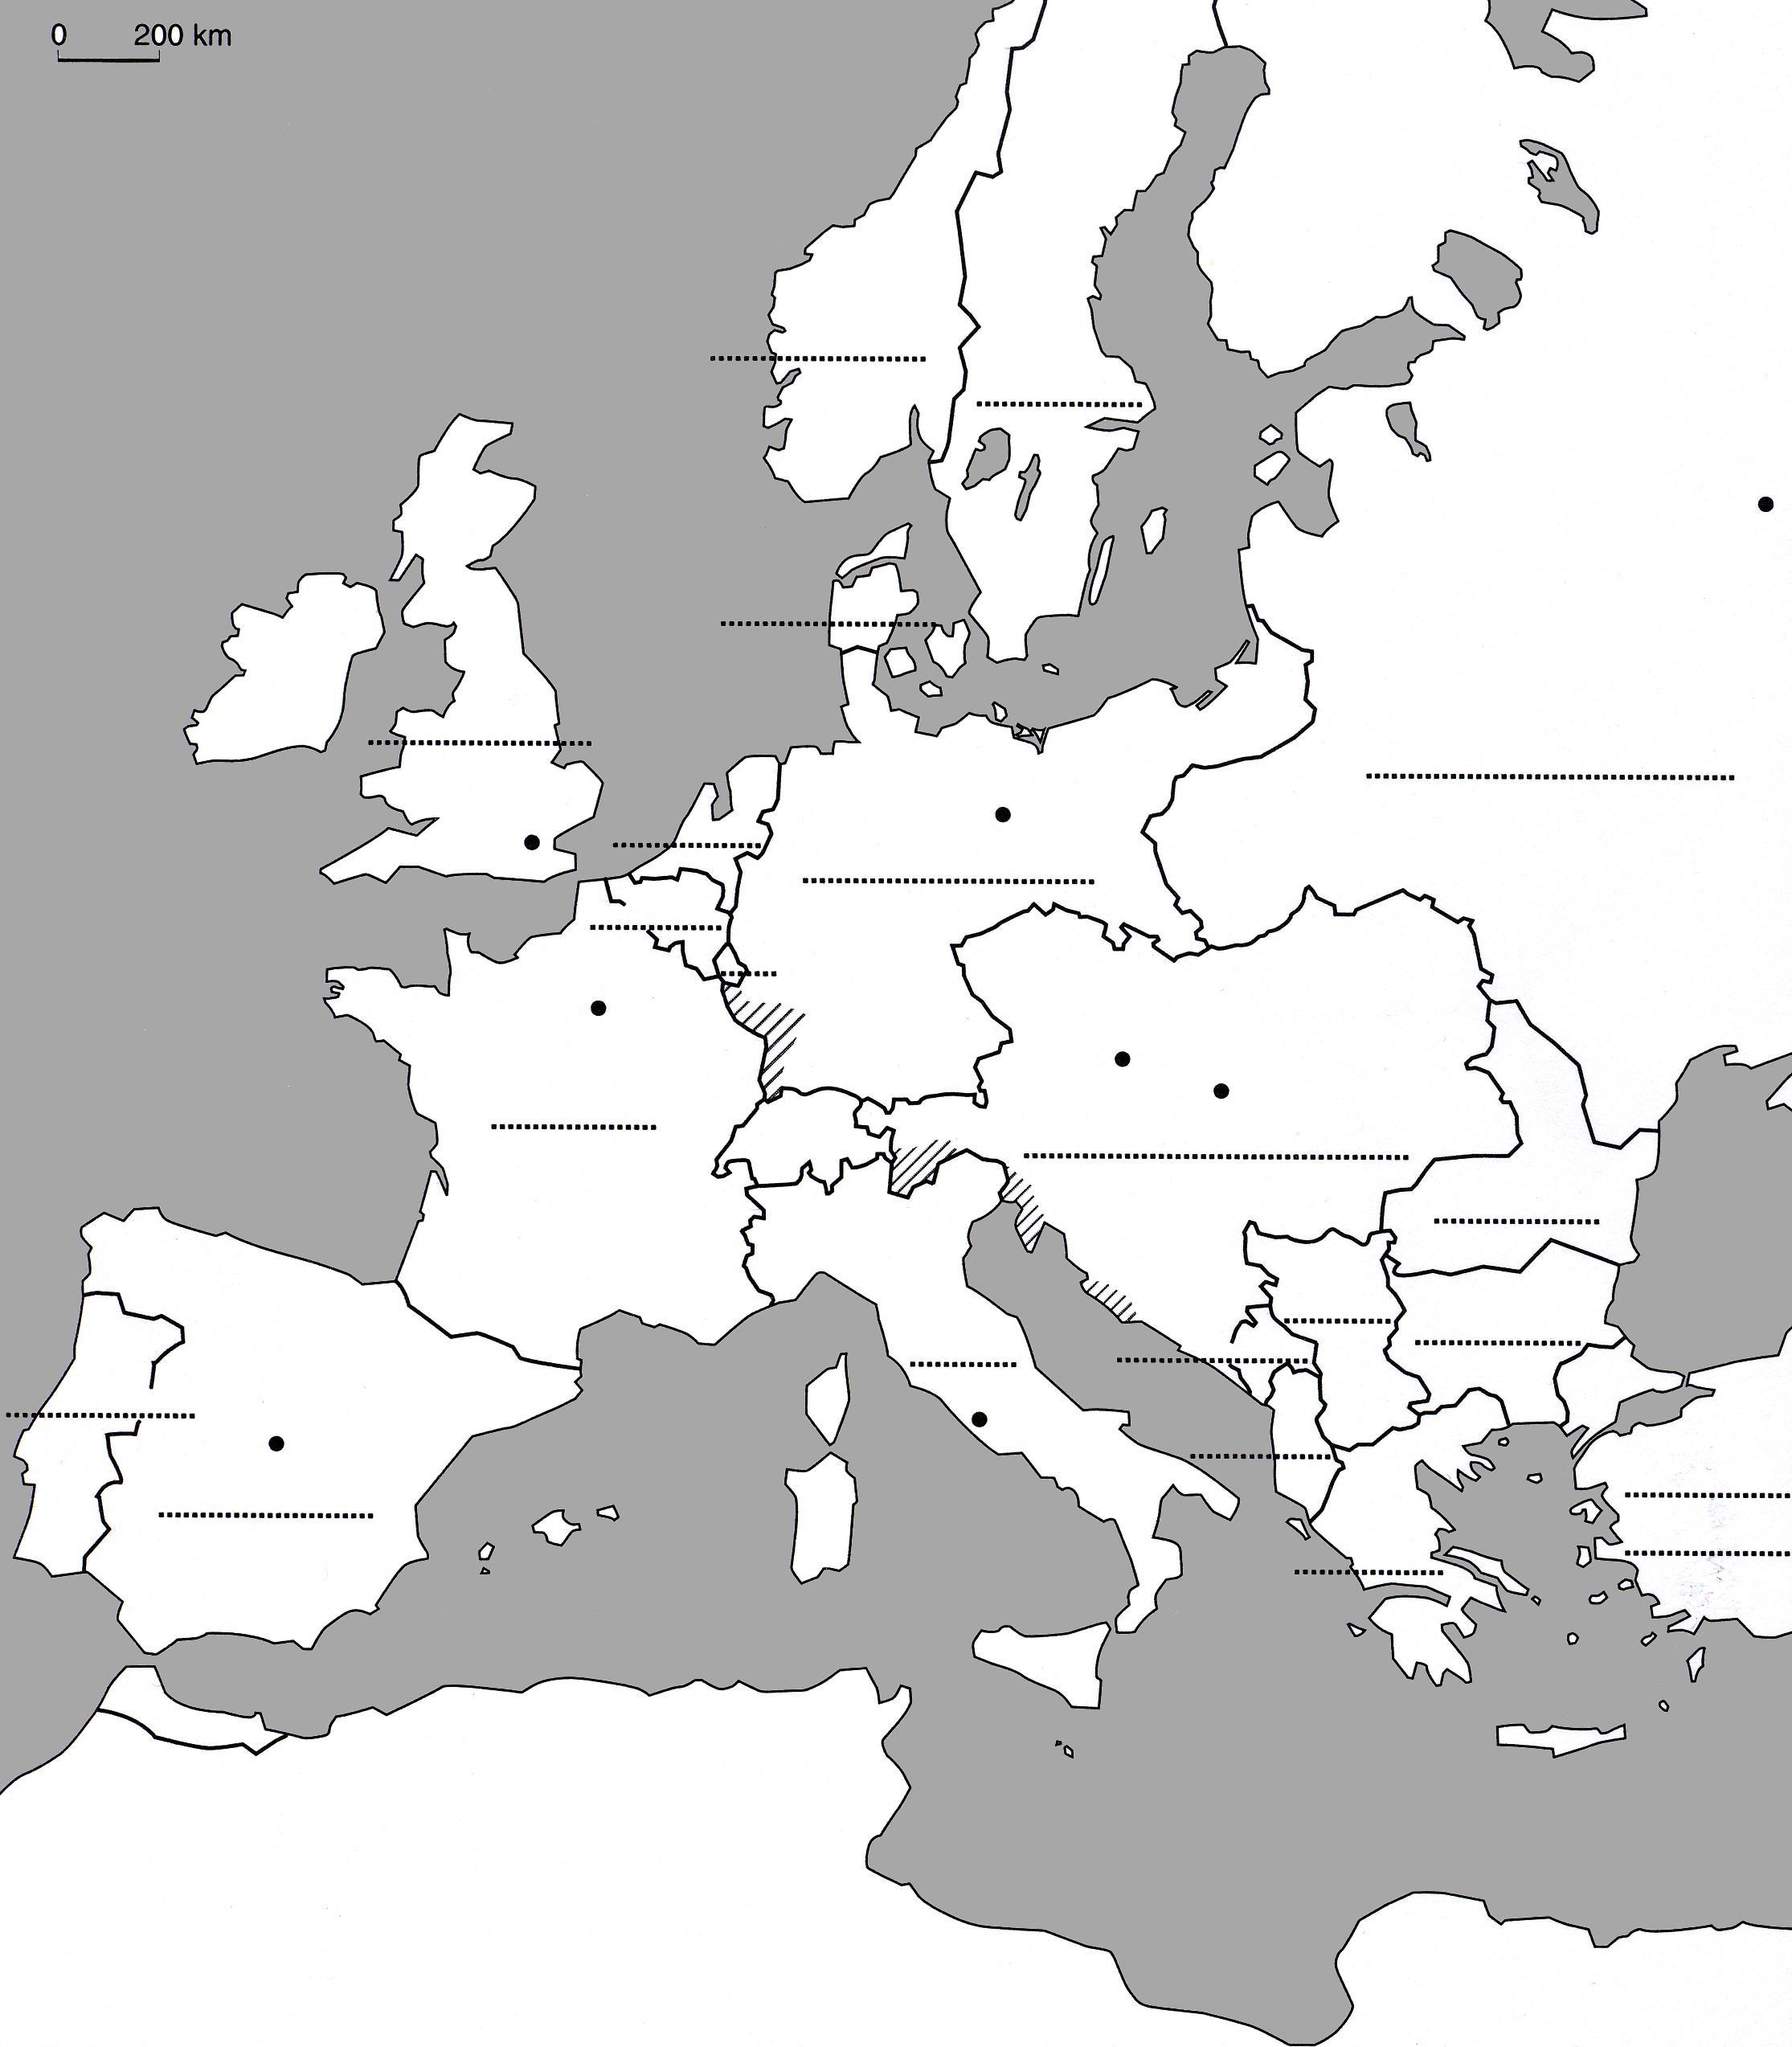 Carte Europe Cm1 À Compléter | My Blog concernant Carte Europe Vierge